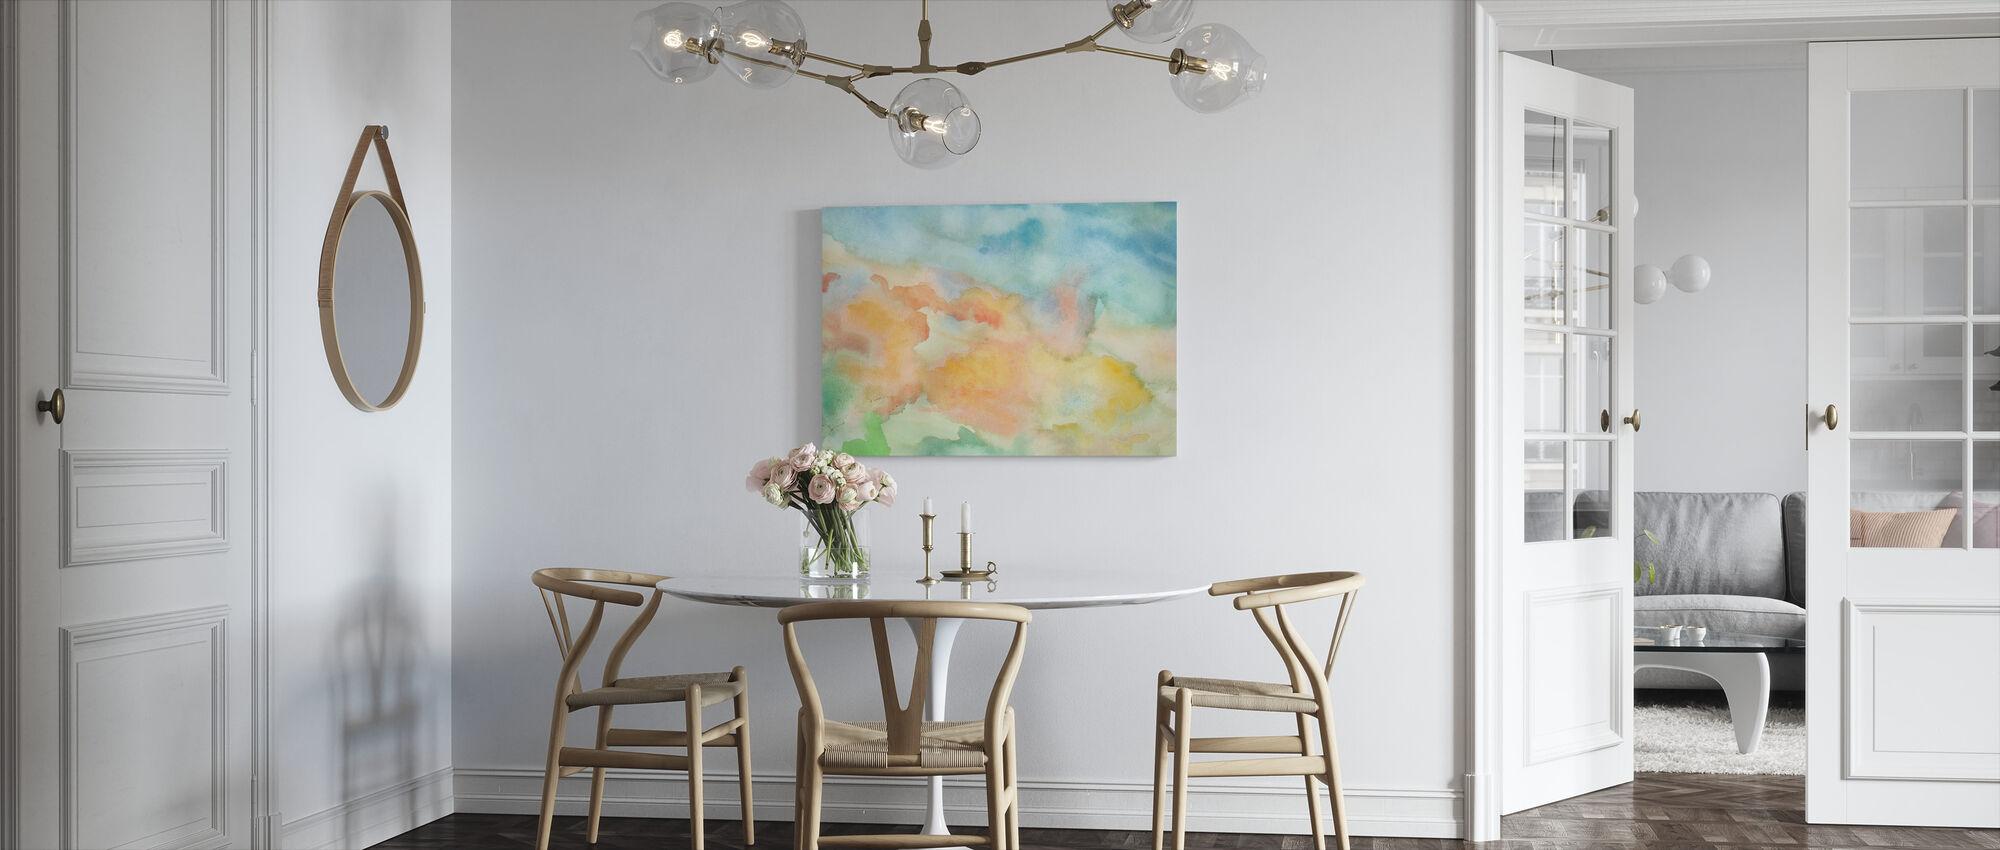 Abstrakti akvarelli taivas - Canvastaulu - Keittiö